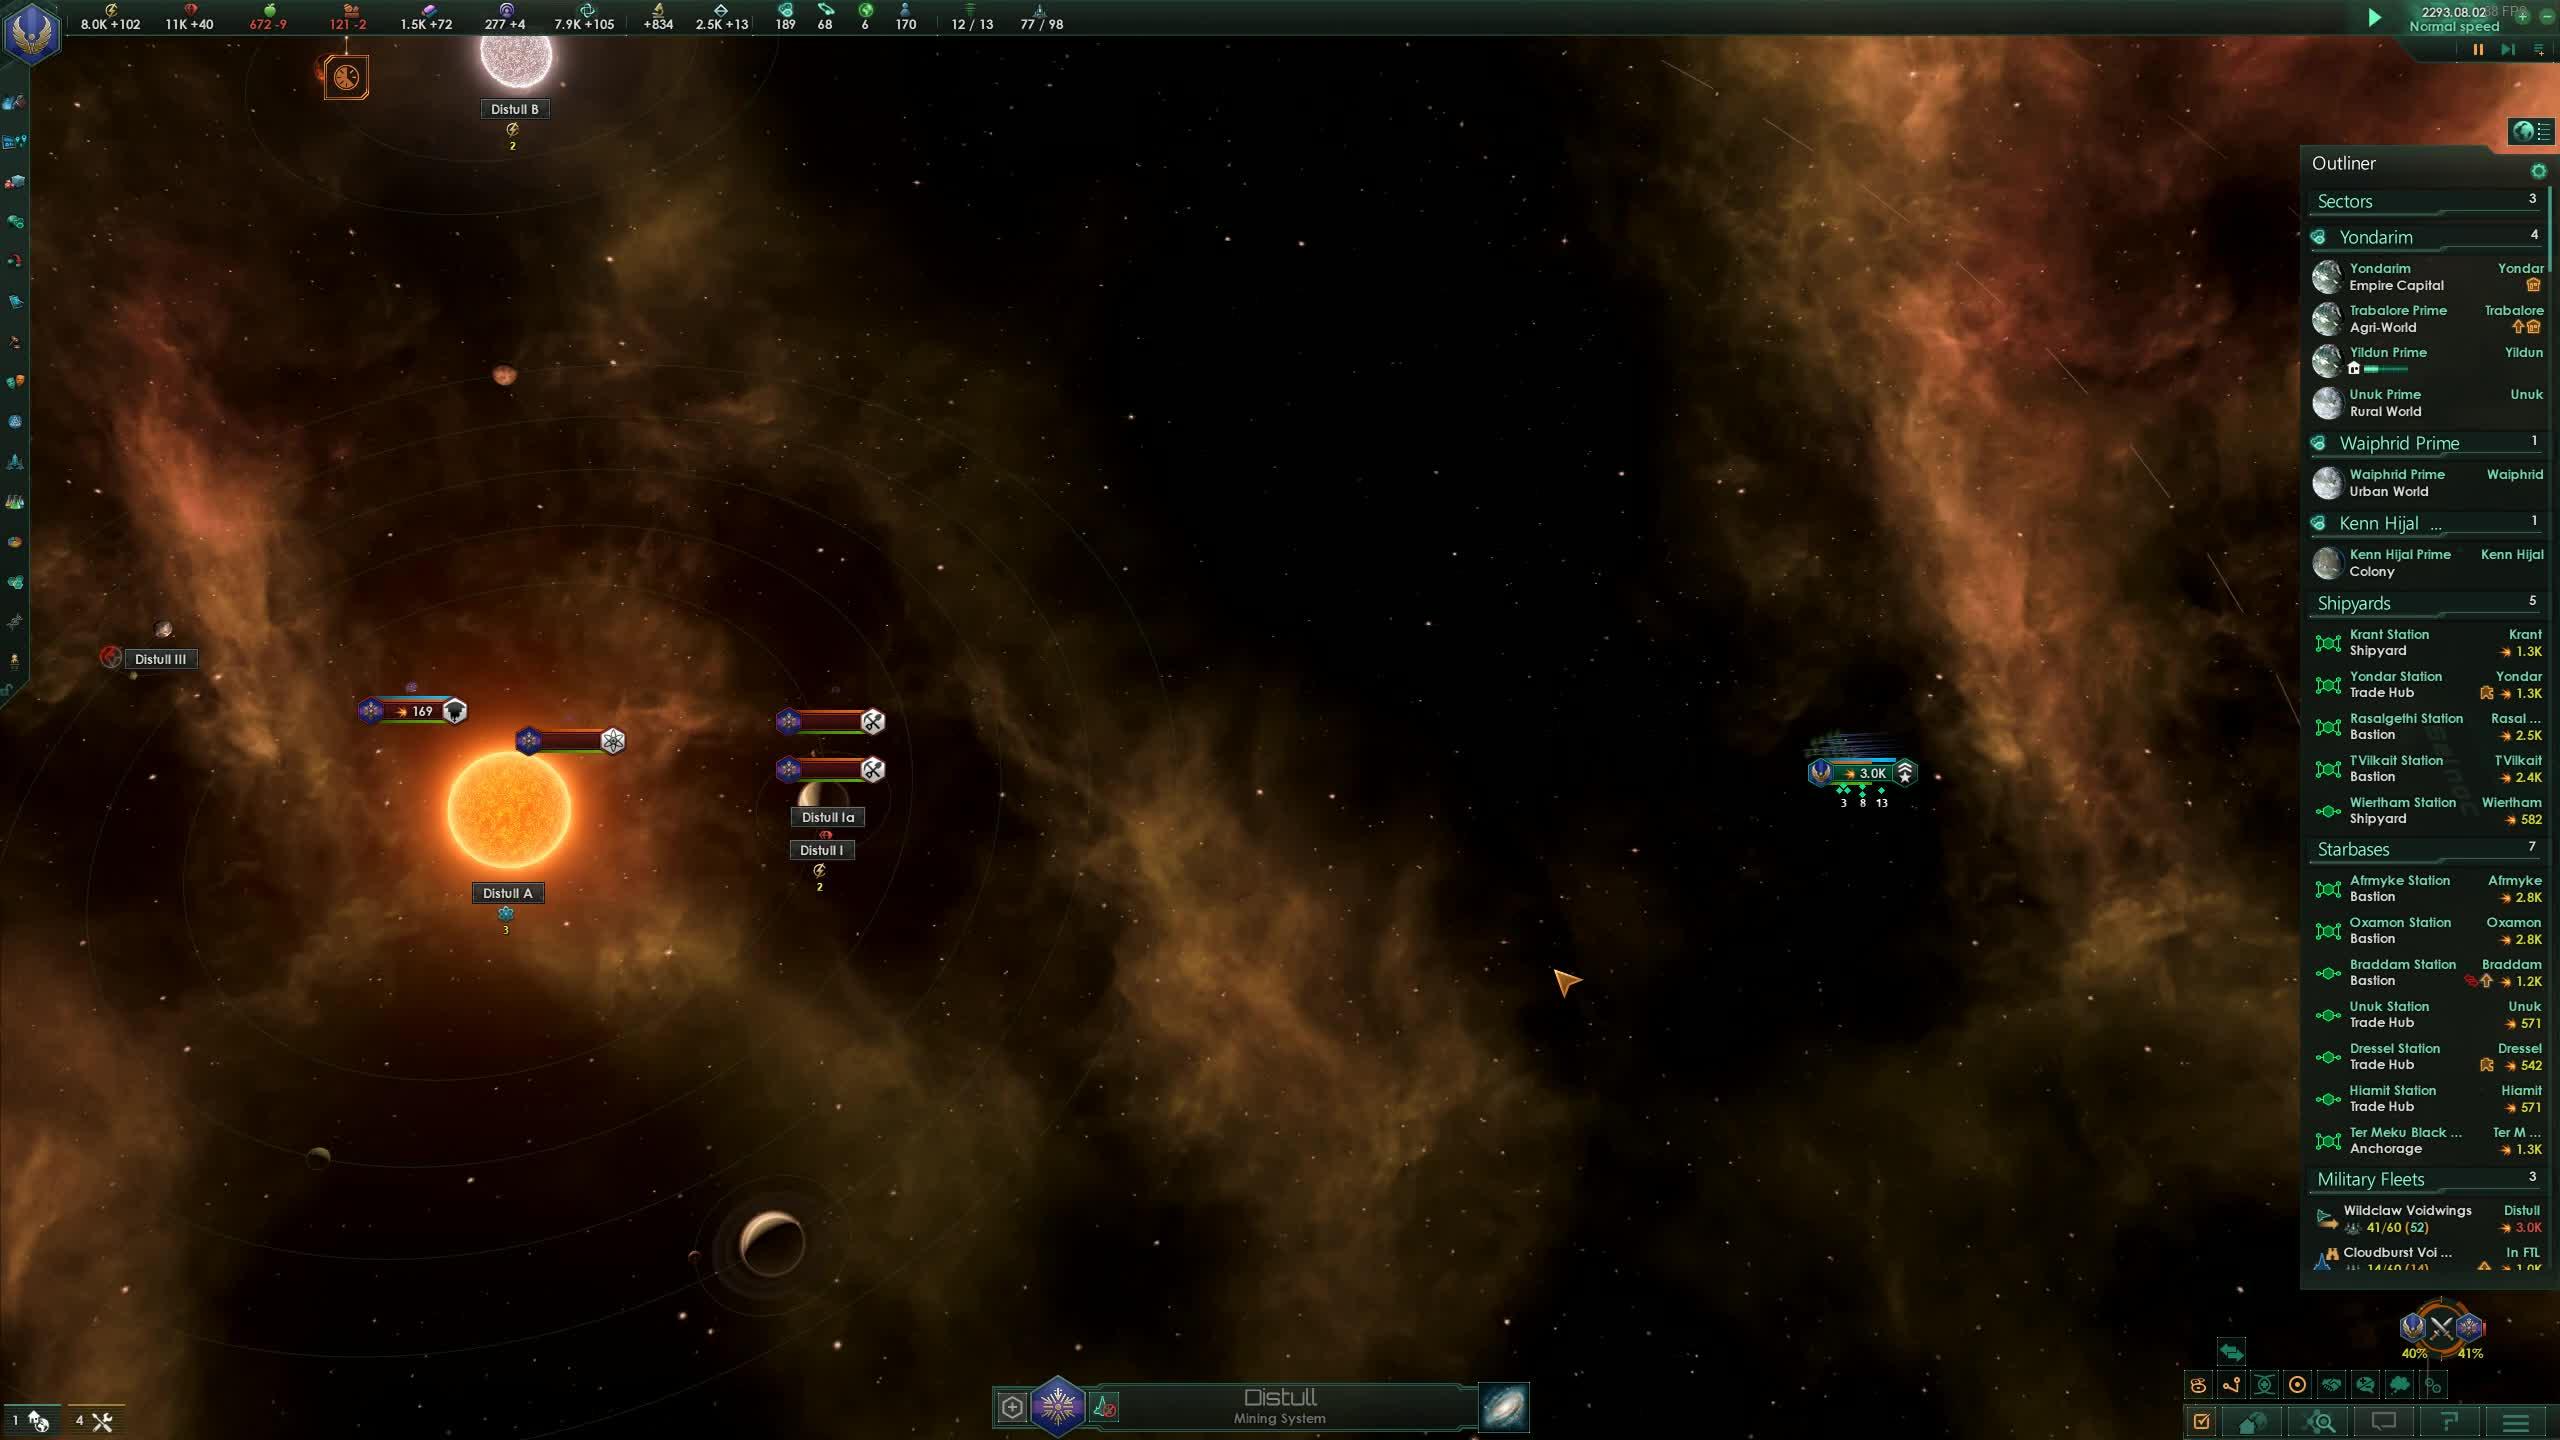 stellaris, Stellaris 2019.03.24 - 22.28.10.02 GIFs